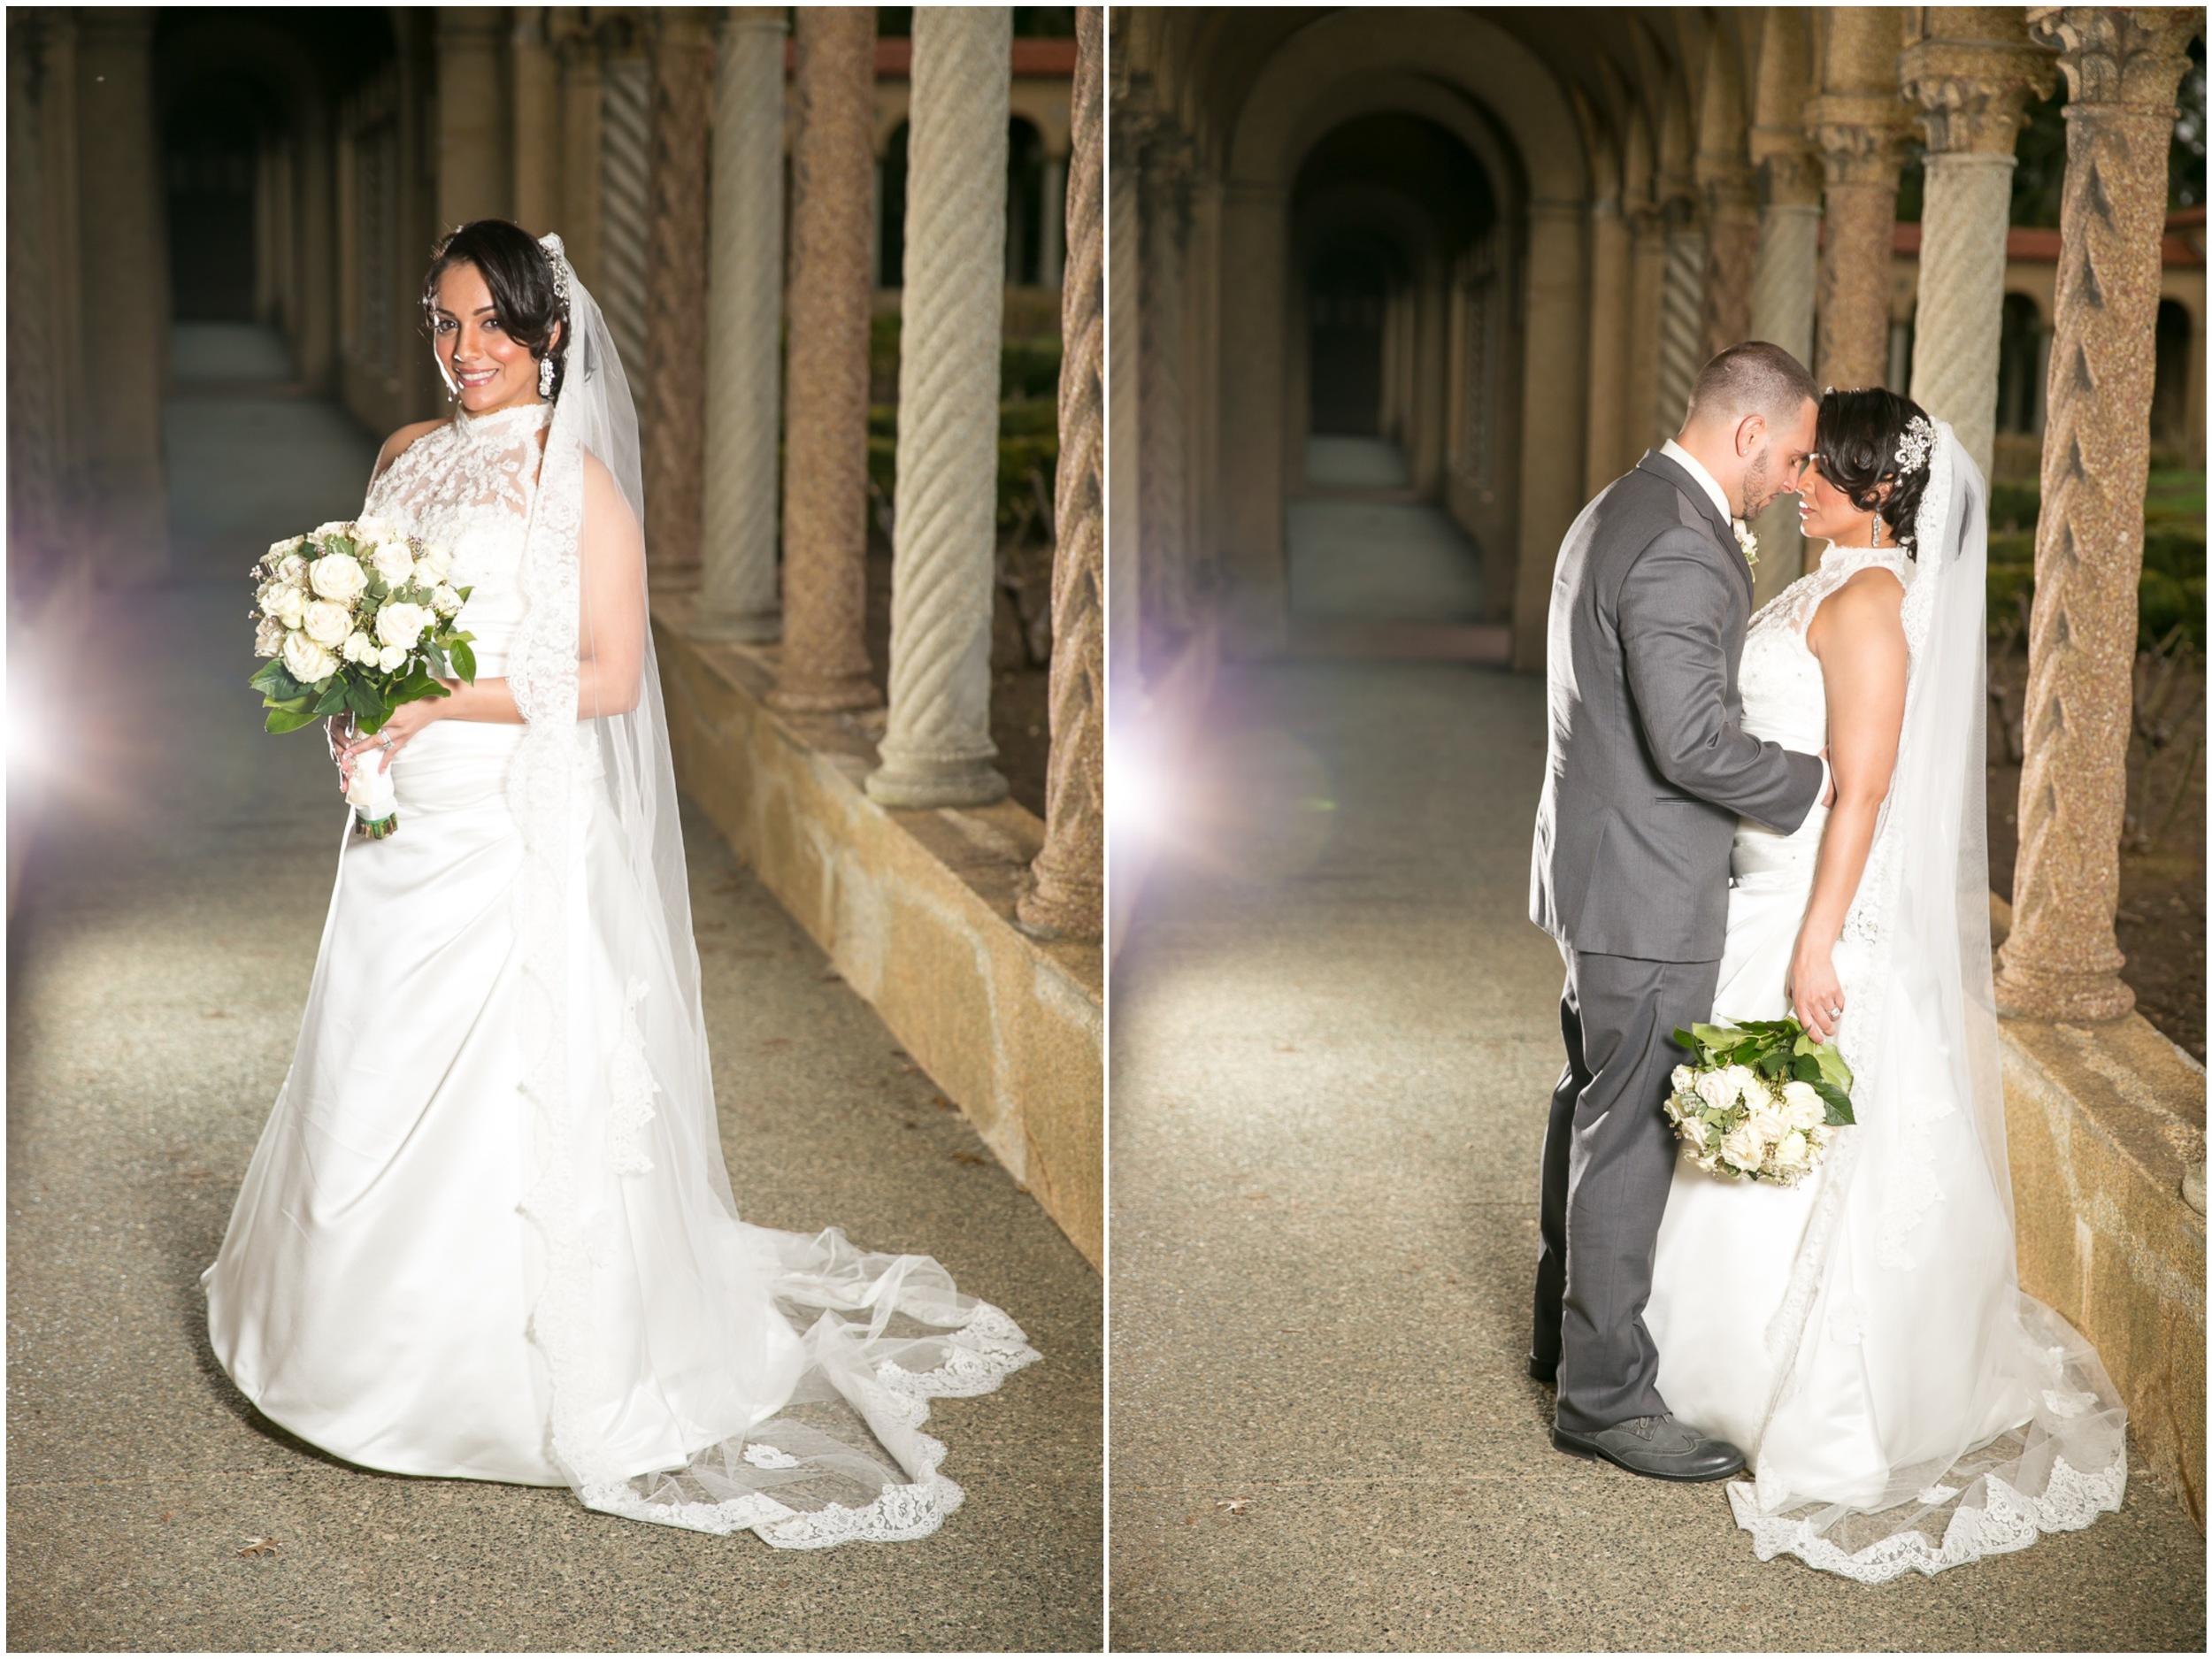 Bradly-and-Jesenia-Wedding-Collage-27.jpg